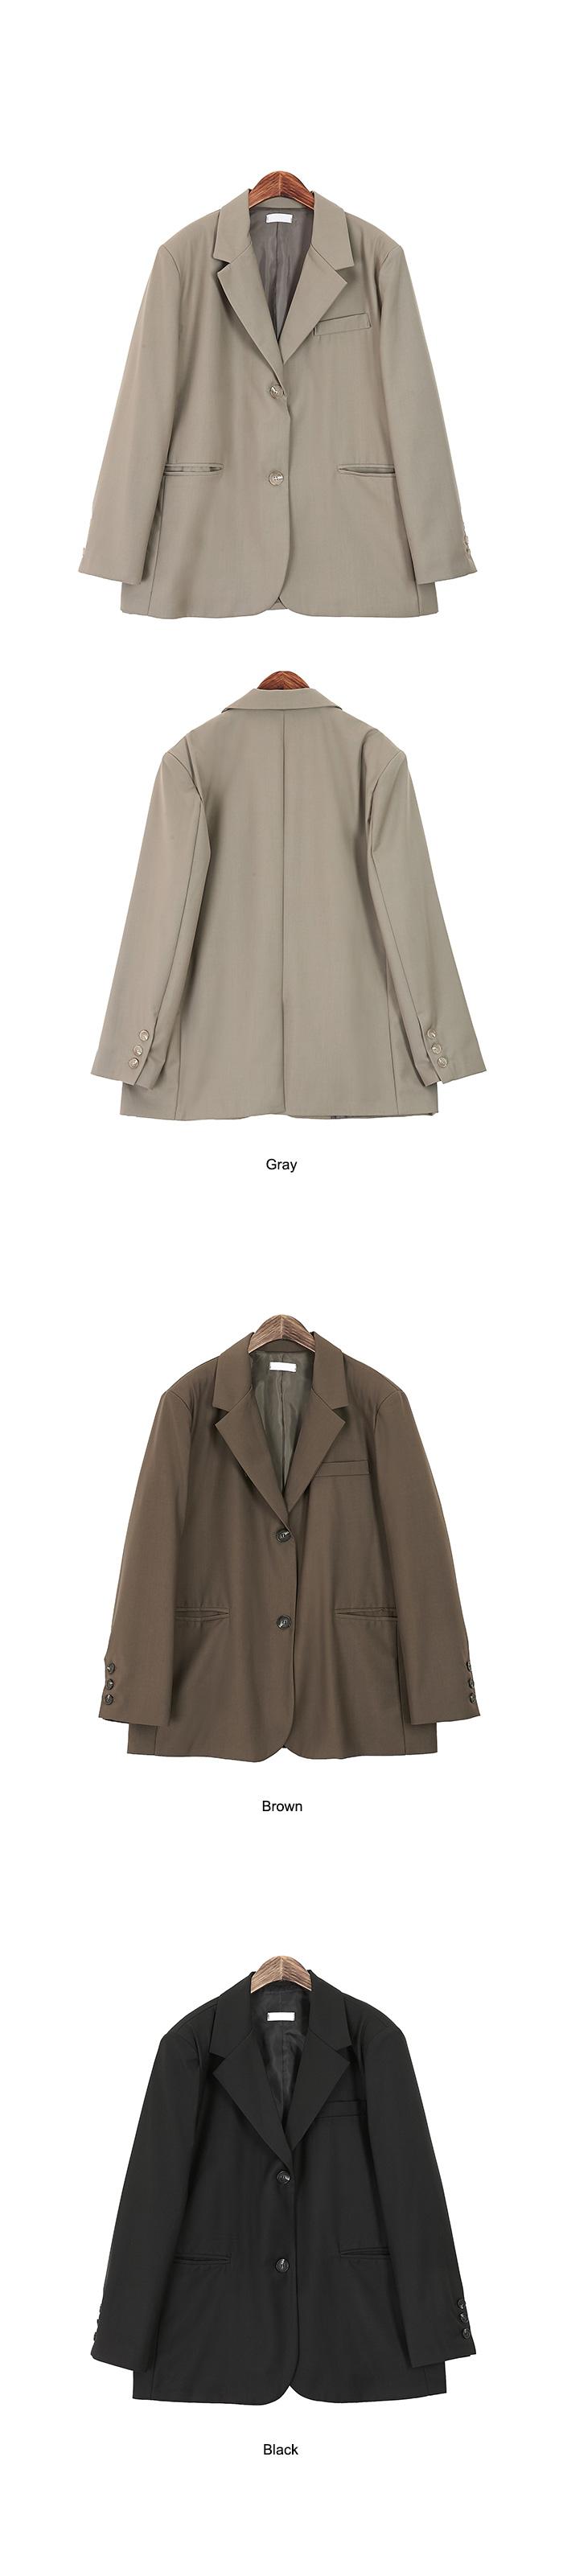 Two-button boxy jacket